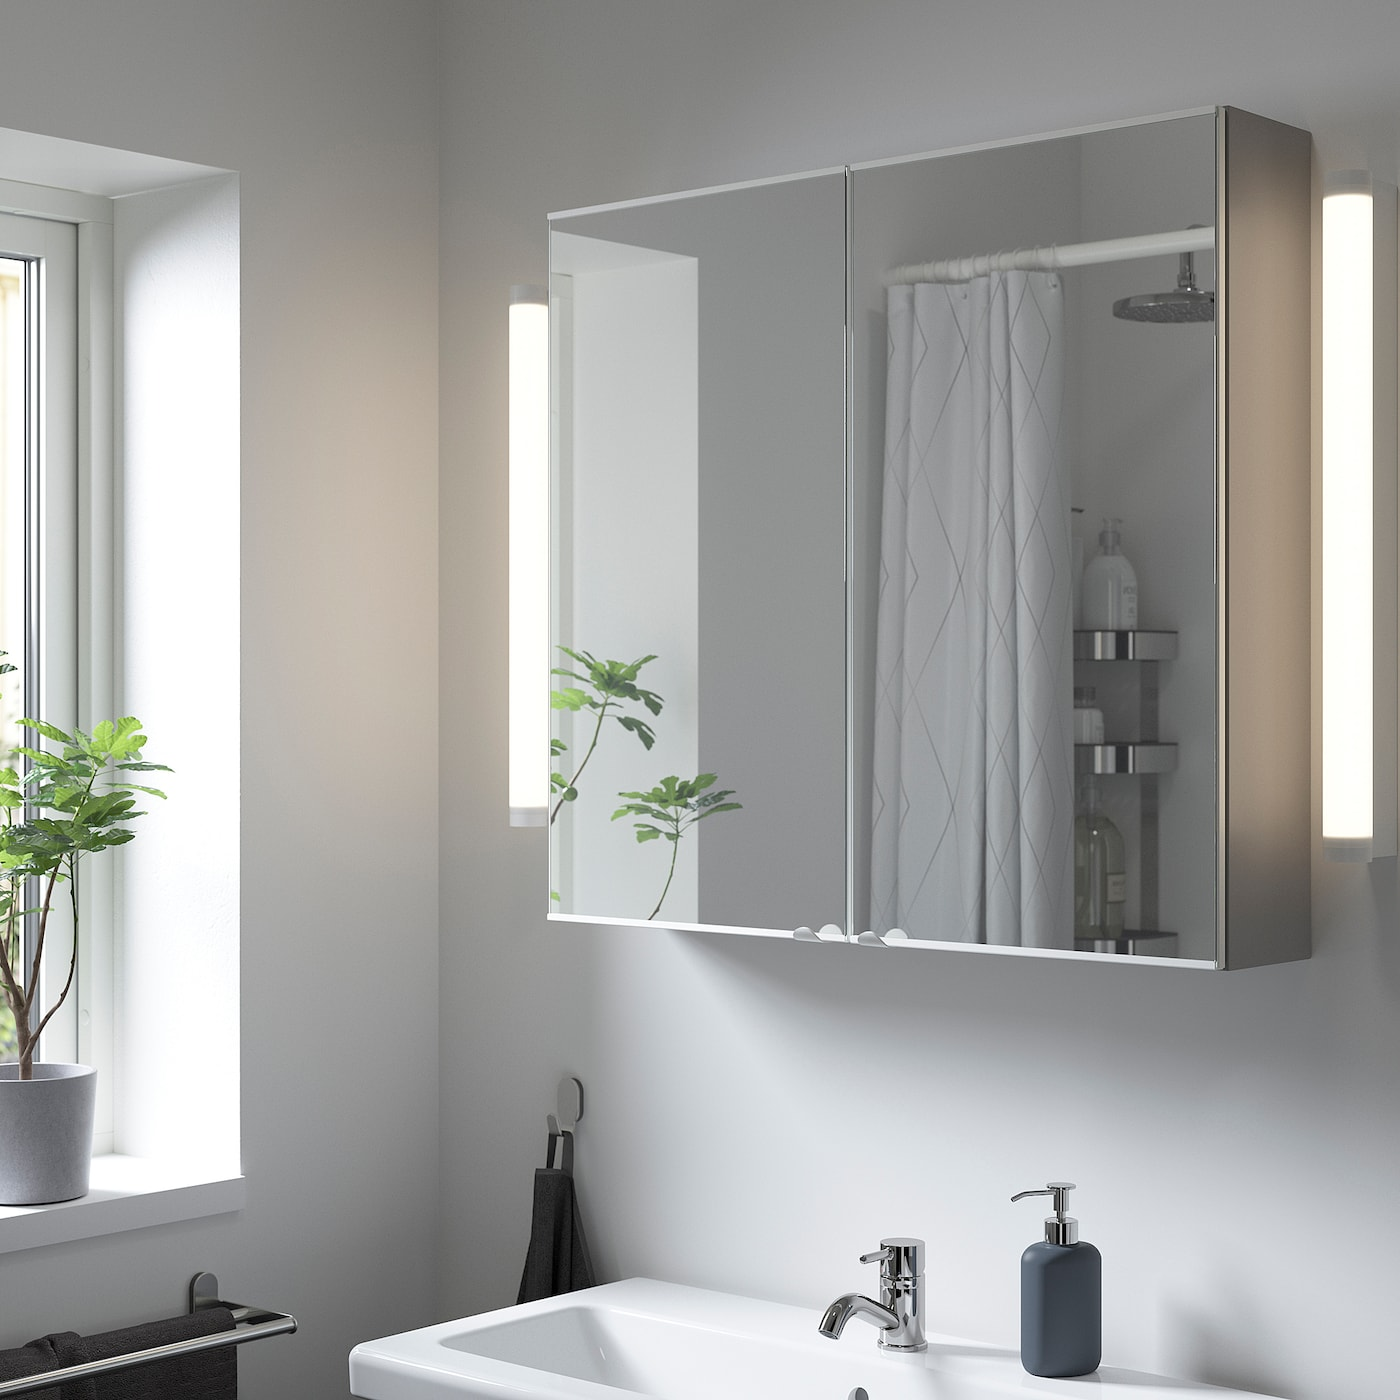 ENHET خزانة بمرآة مع بابين, رمادي, 80x17x75 سم